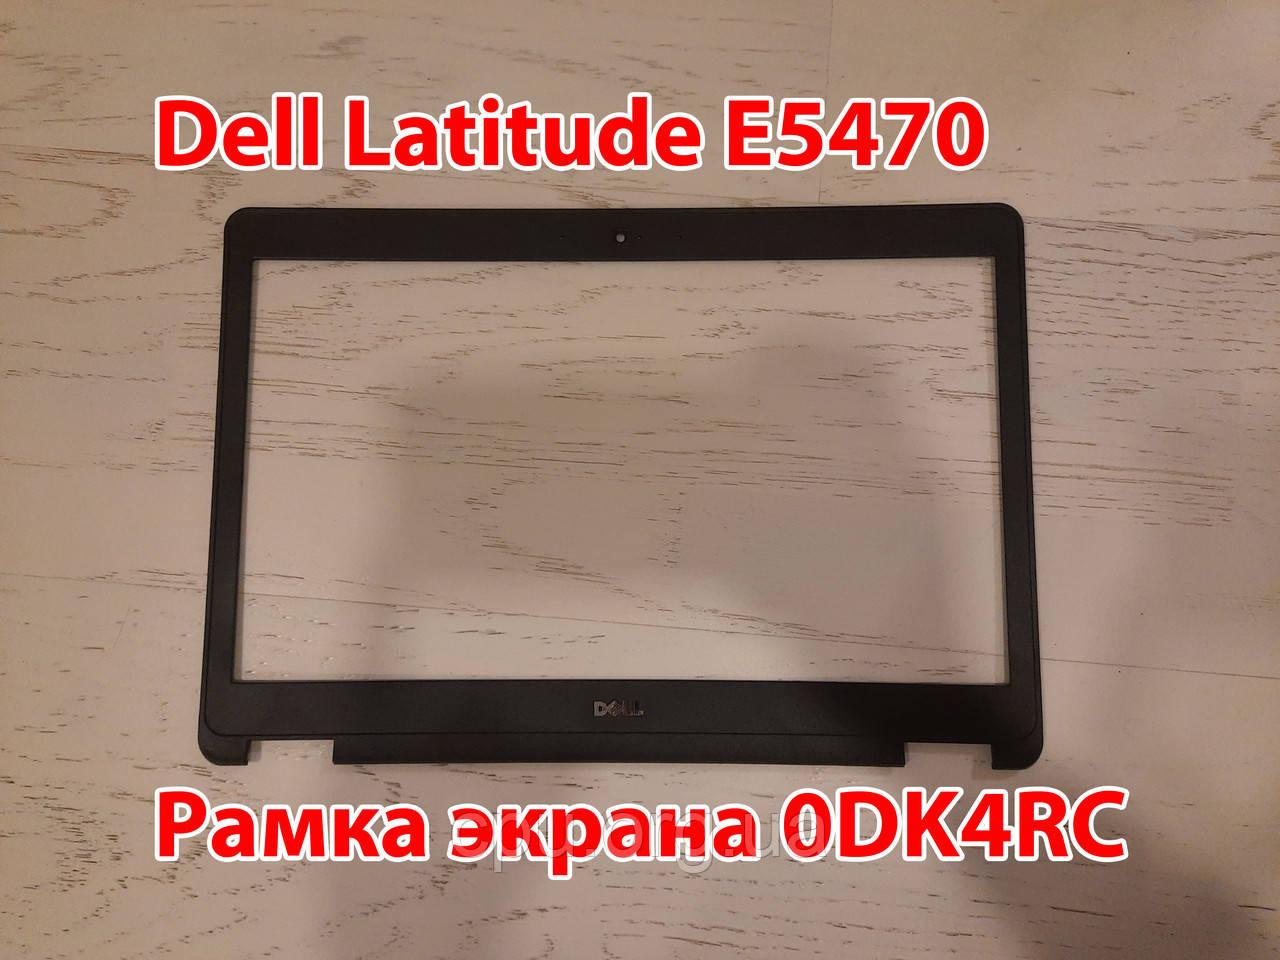 Нова рамка екрану Dell Latitude E5470